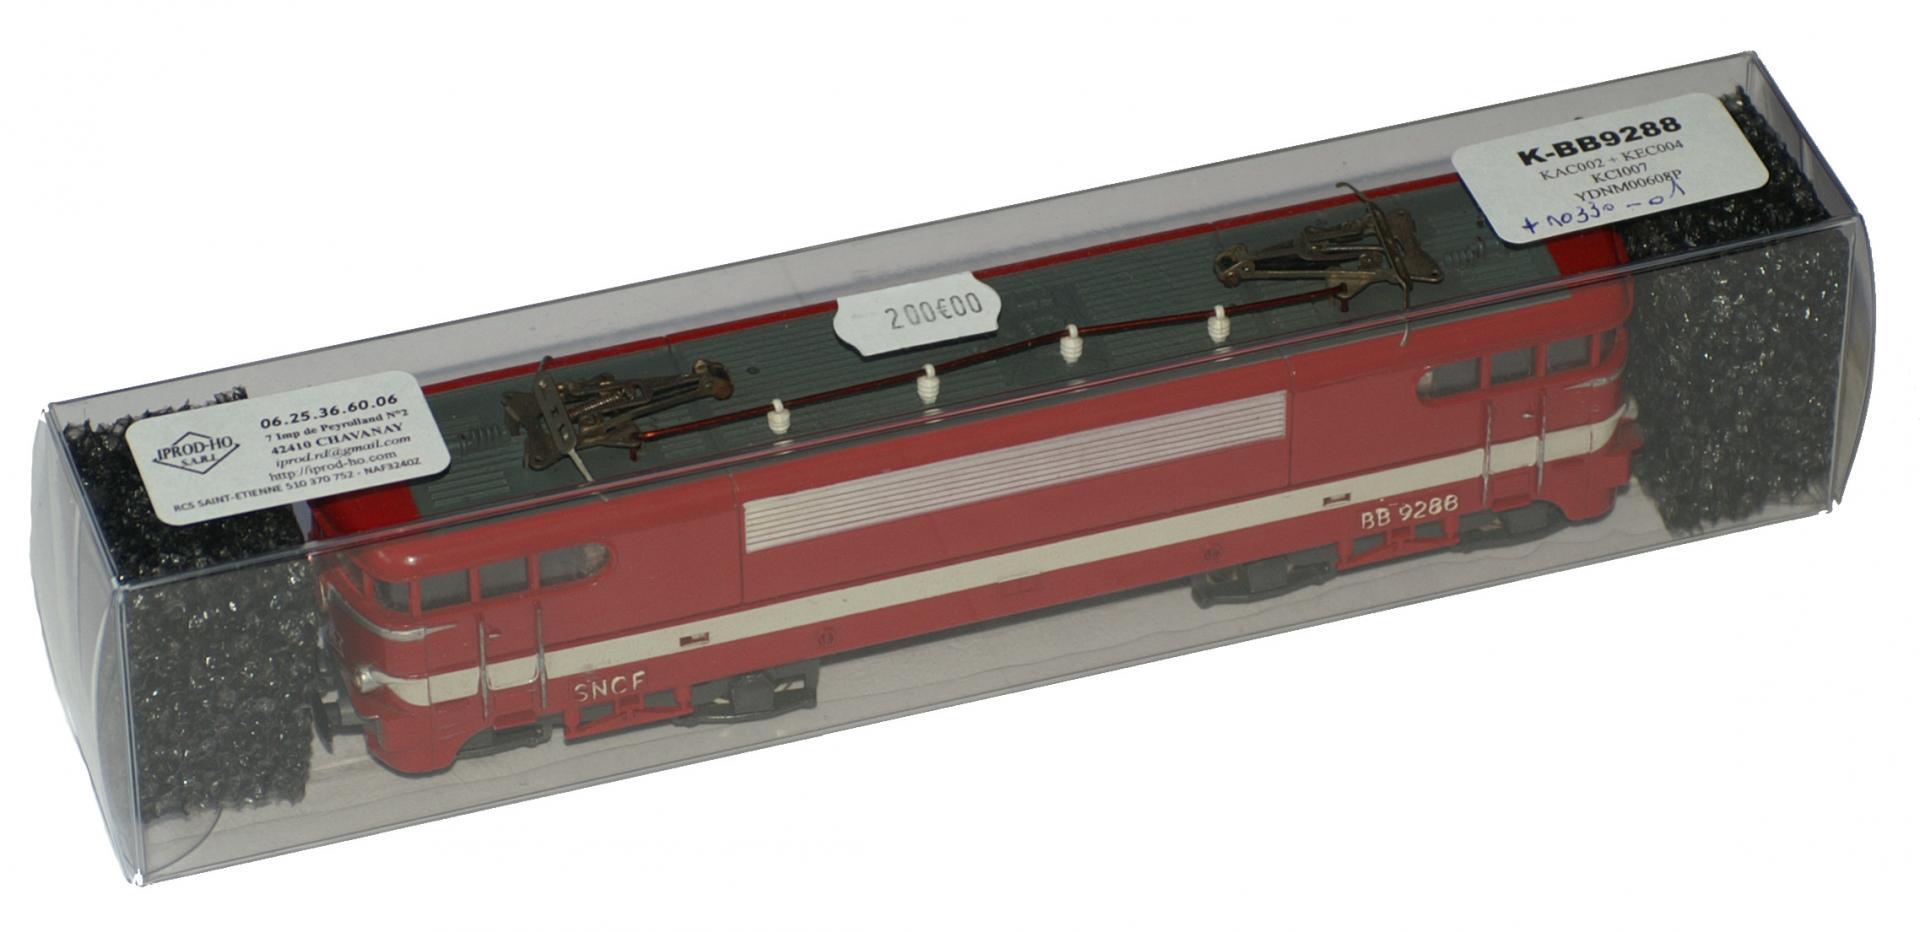 K bb9288